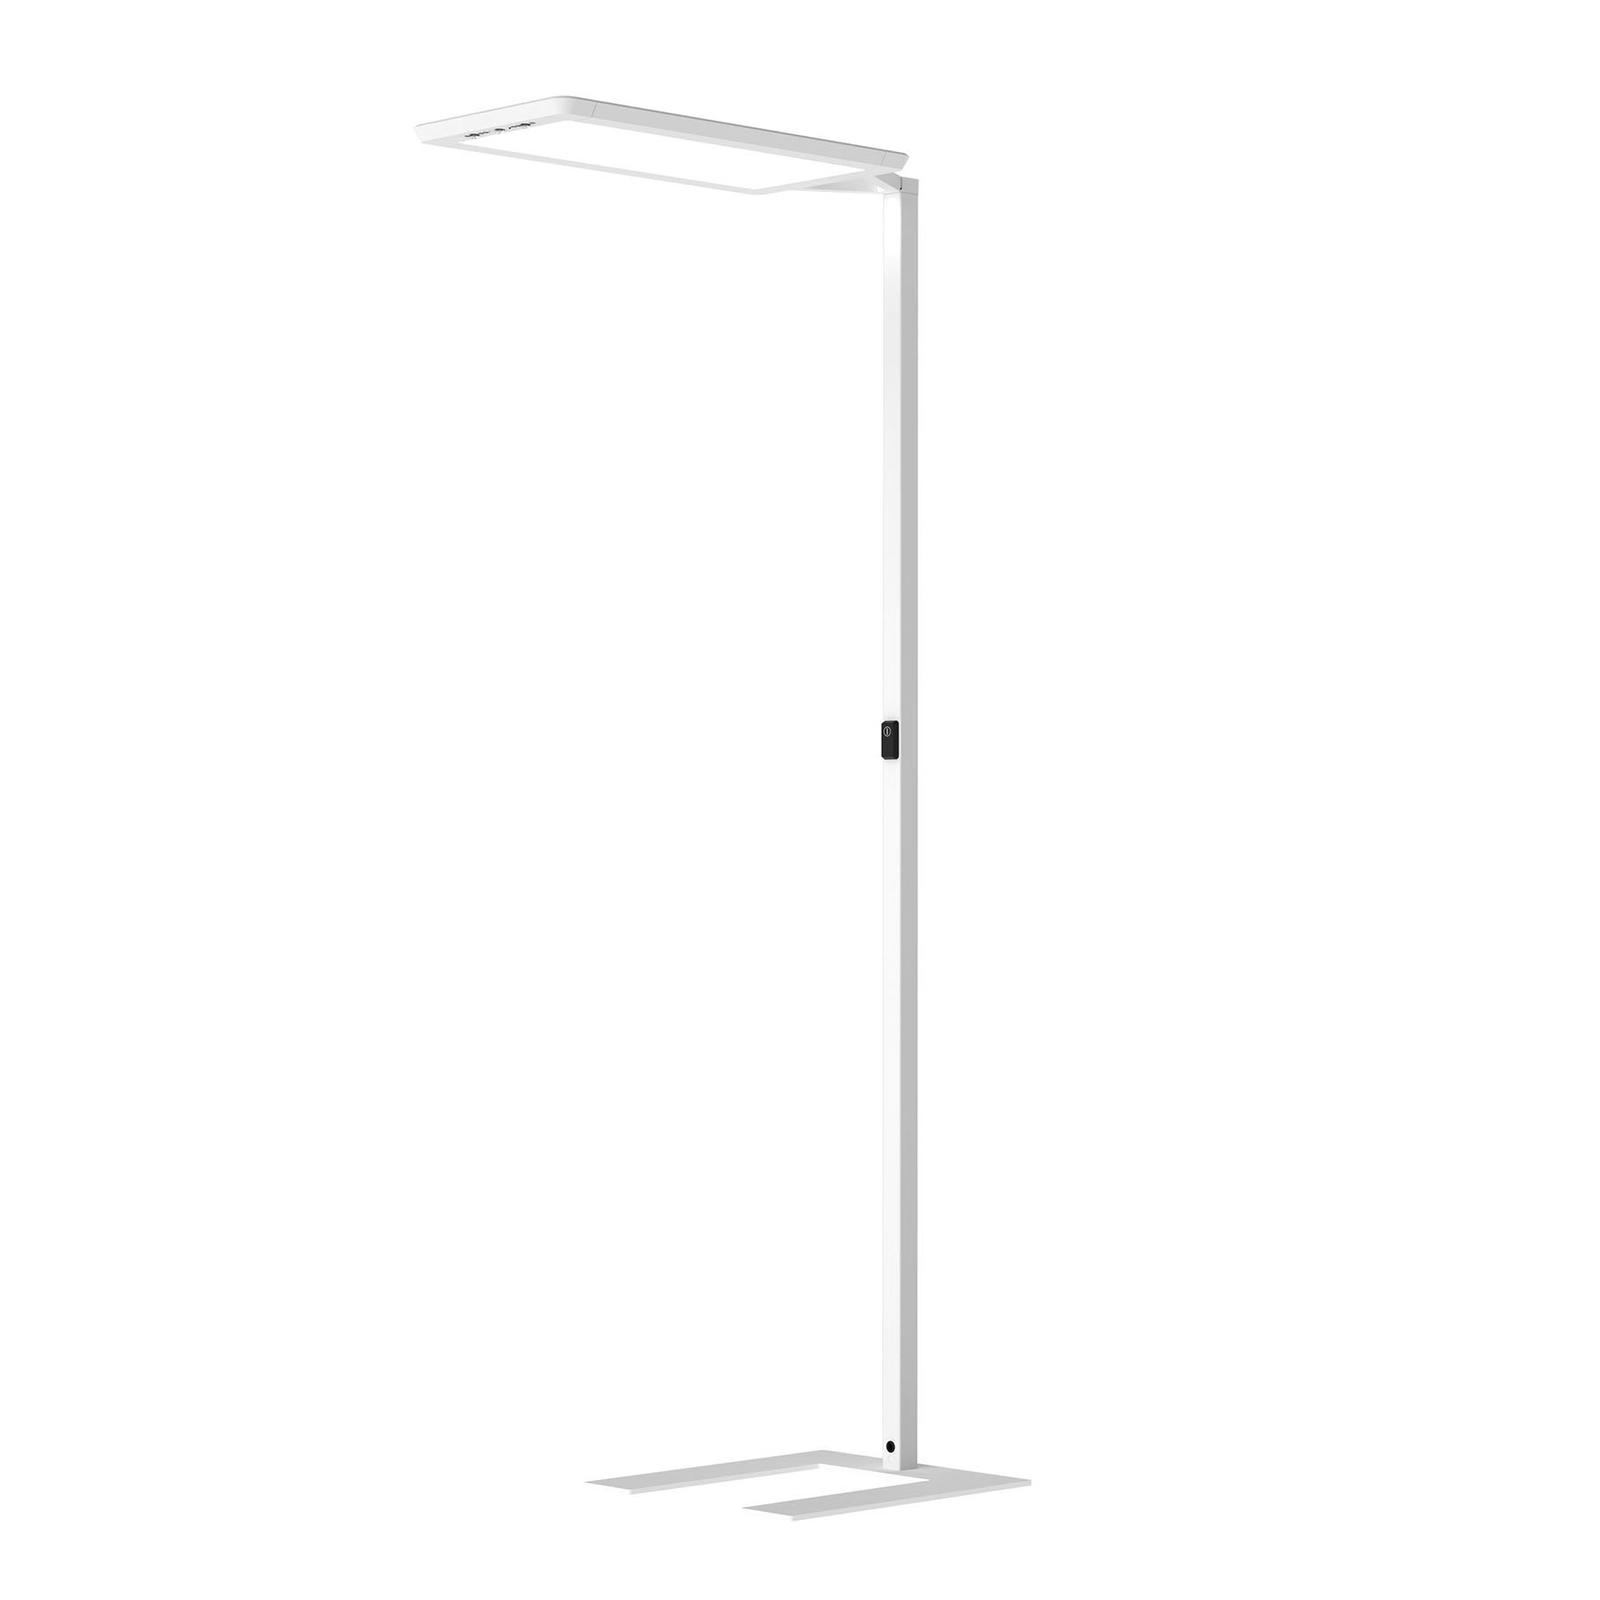 LED-Stehlampe Yara.single VTL, BT, LTX, weiß